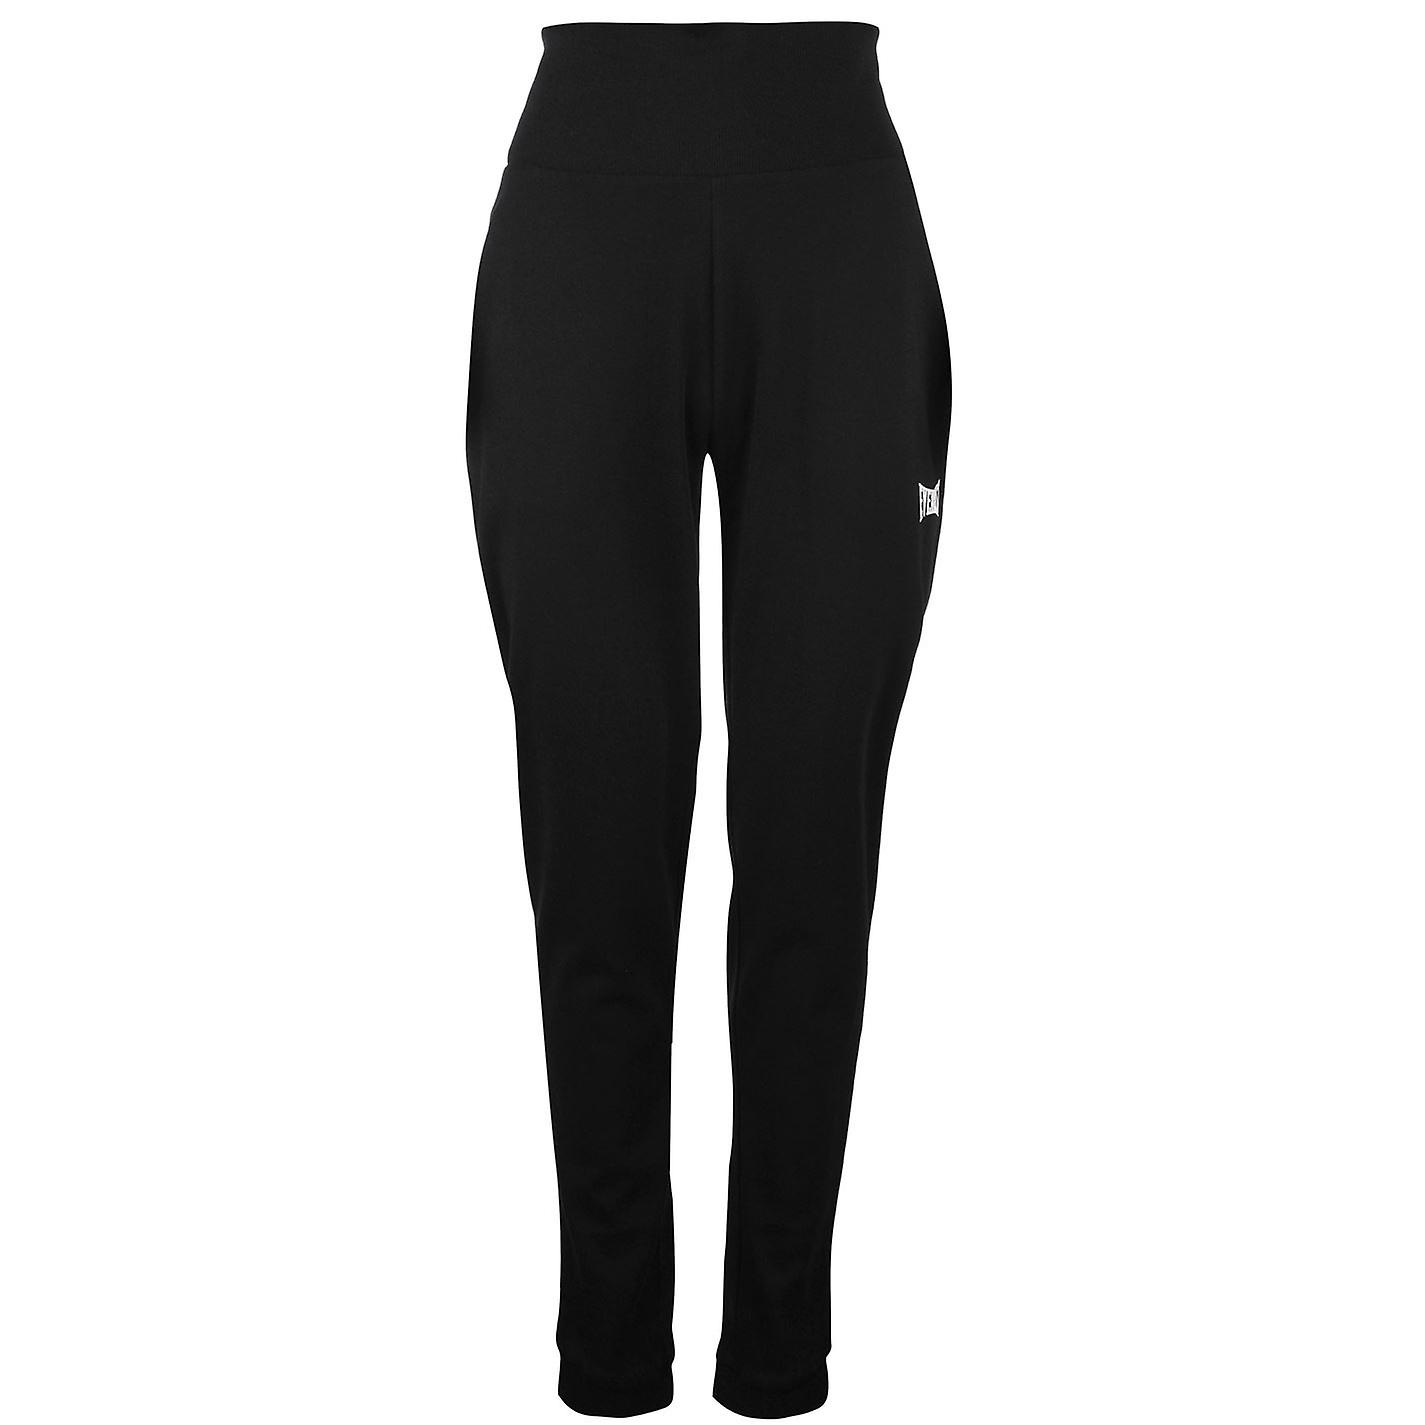 ADIDAS Collant OTR Donna Performance Pants Pantaloni Bottoms leggero zip